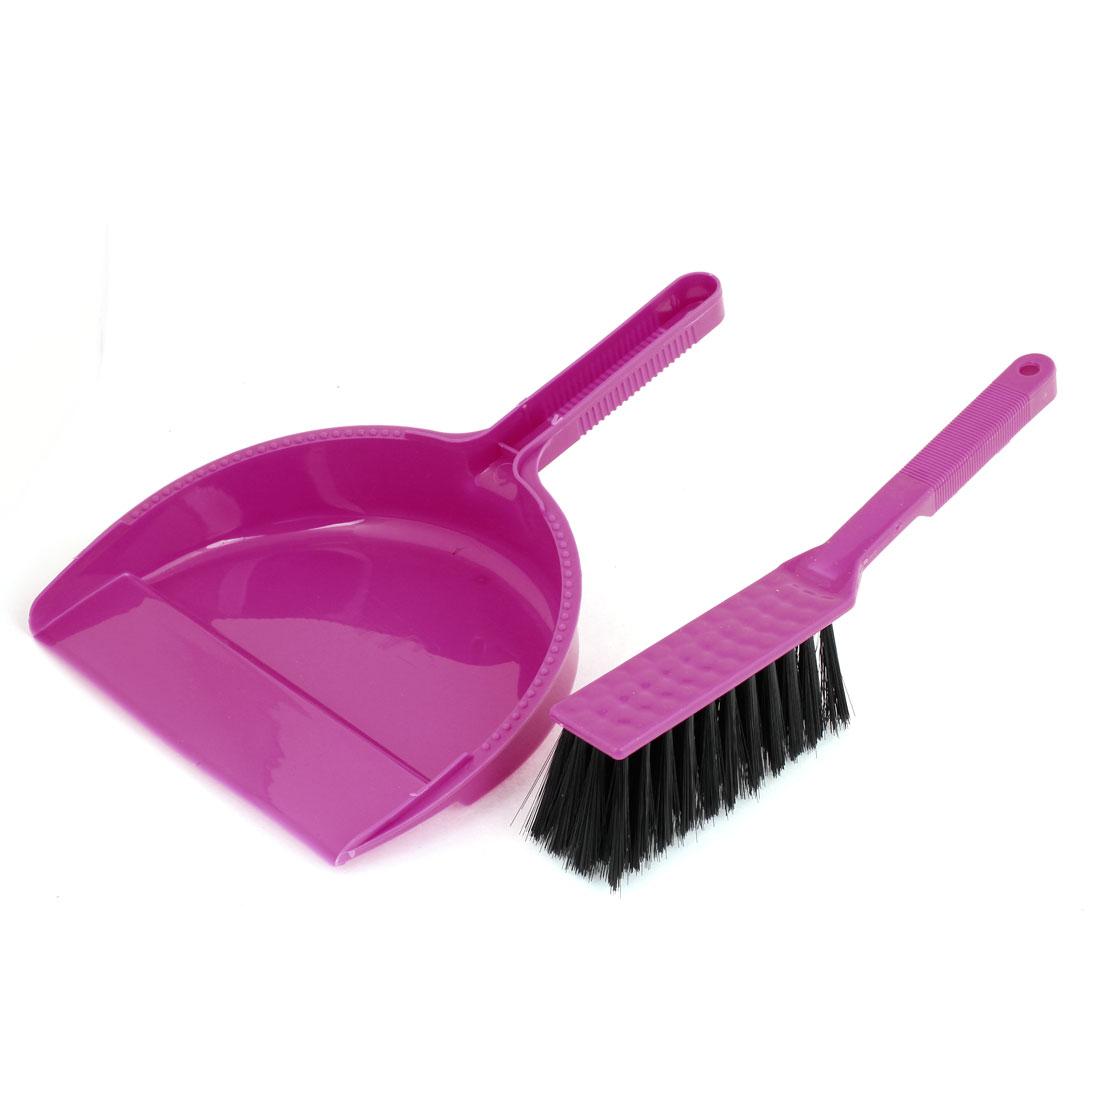 Home Computer Fuchsia Black Mini Brush Dustpan Cleaning Tool Set